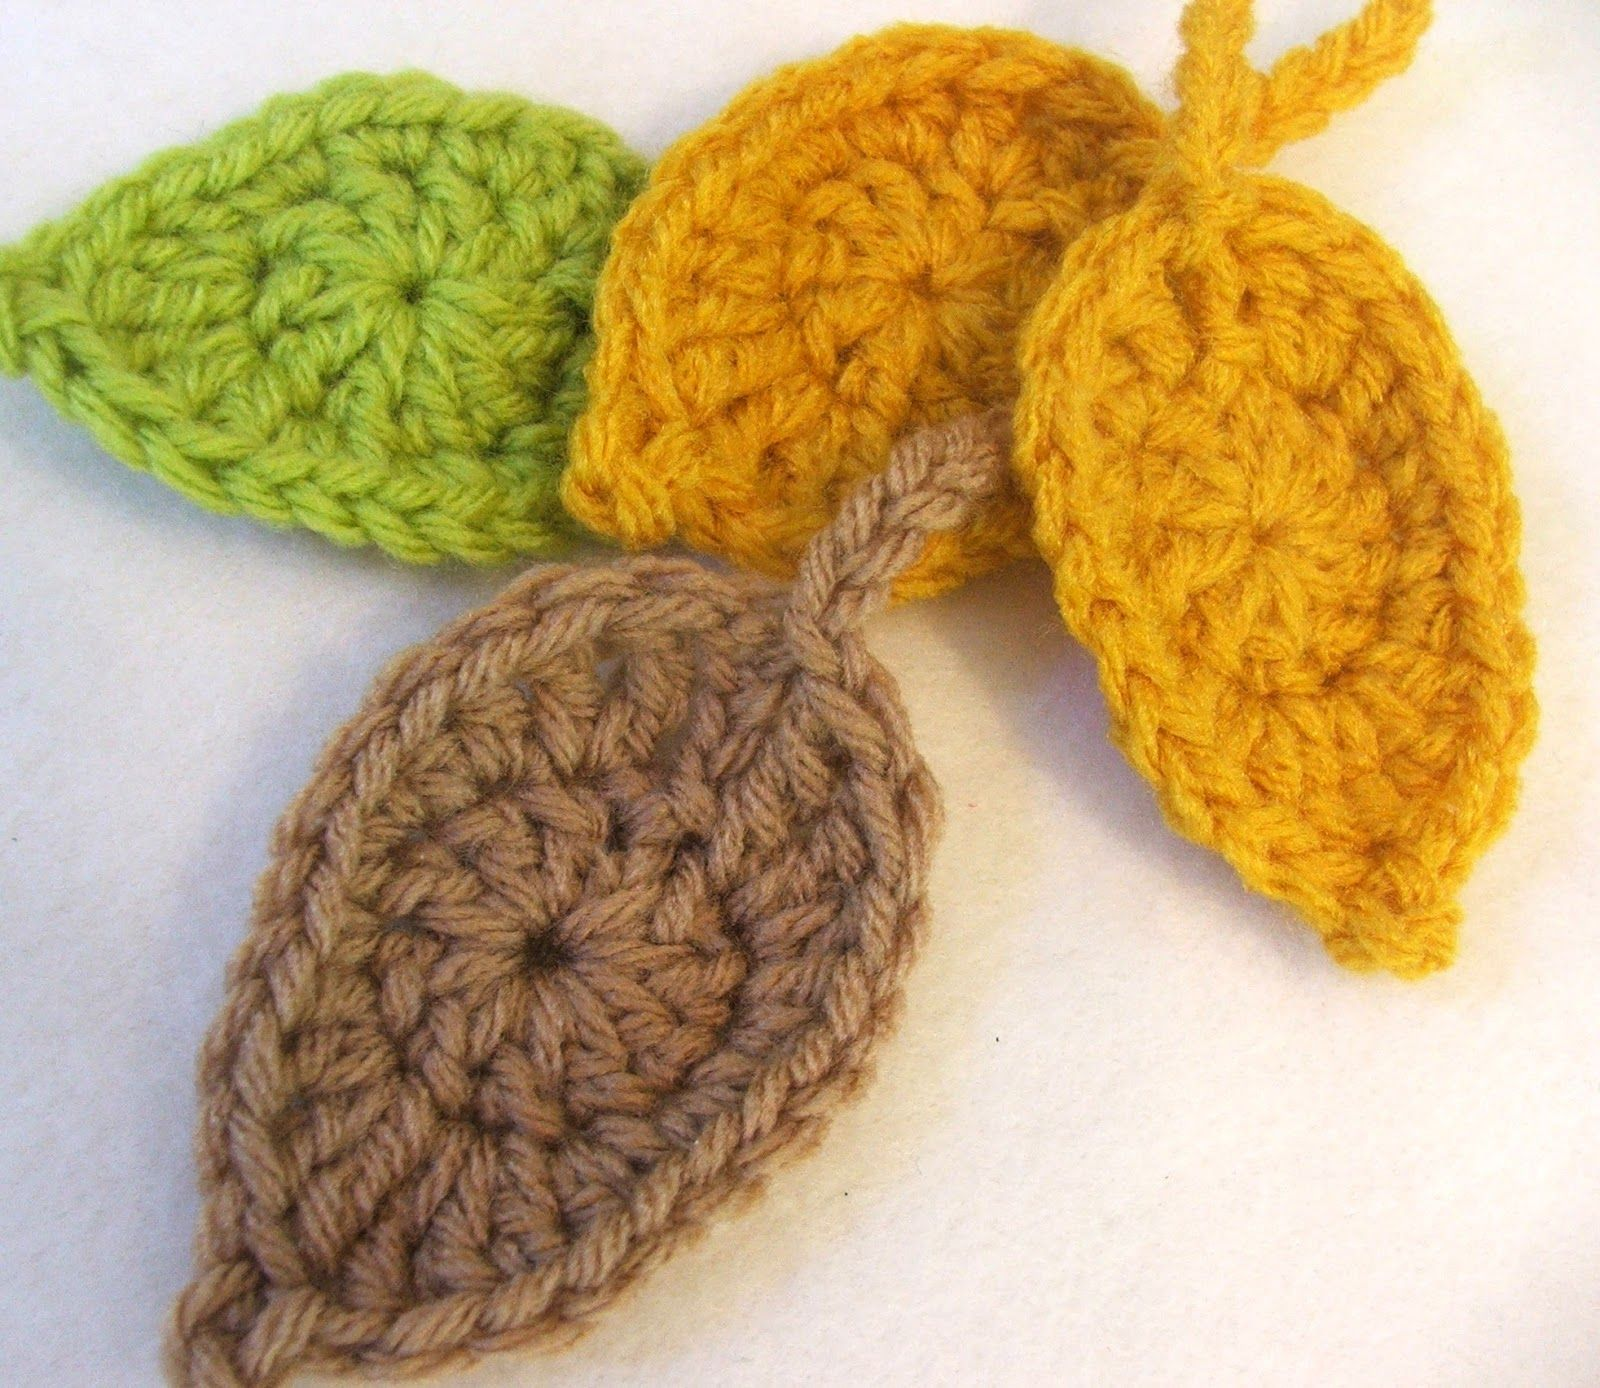 Susans hippie crochet free simple leaf crochet pattern the susans hippie crochet free simple leaf crochet pattern the leaves are falling soon dt1010fo